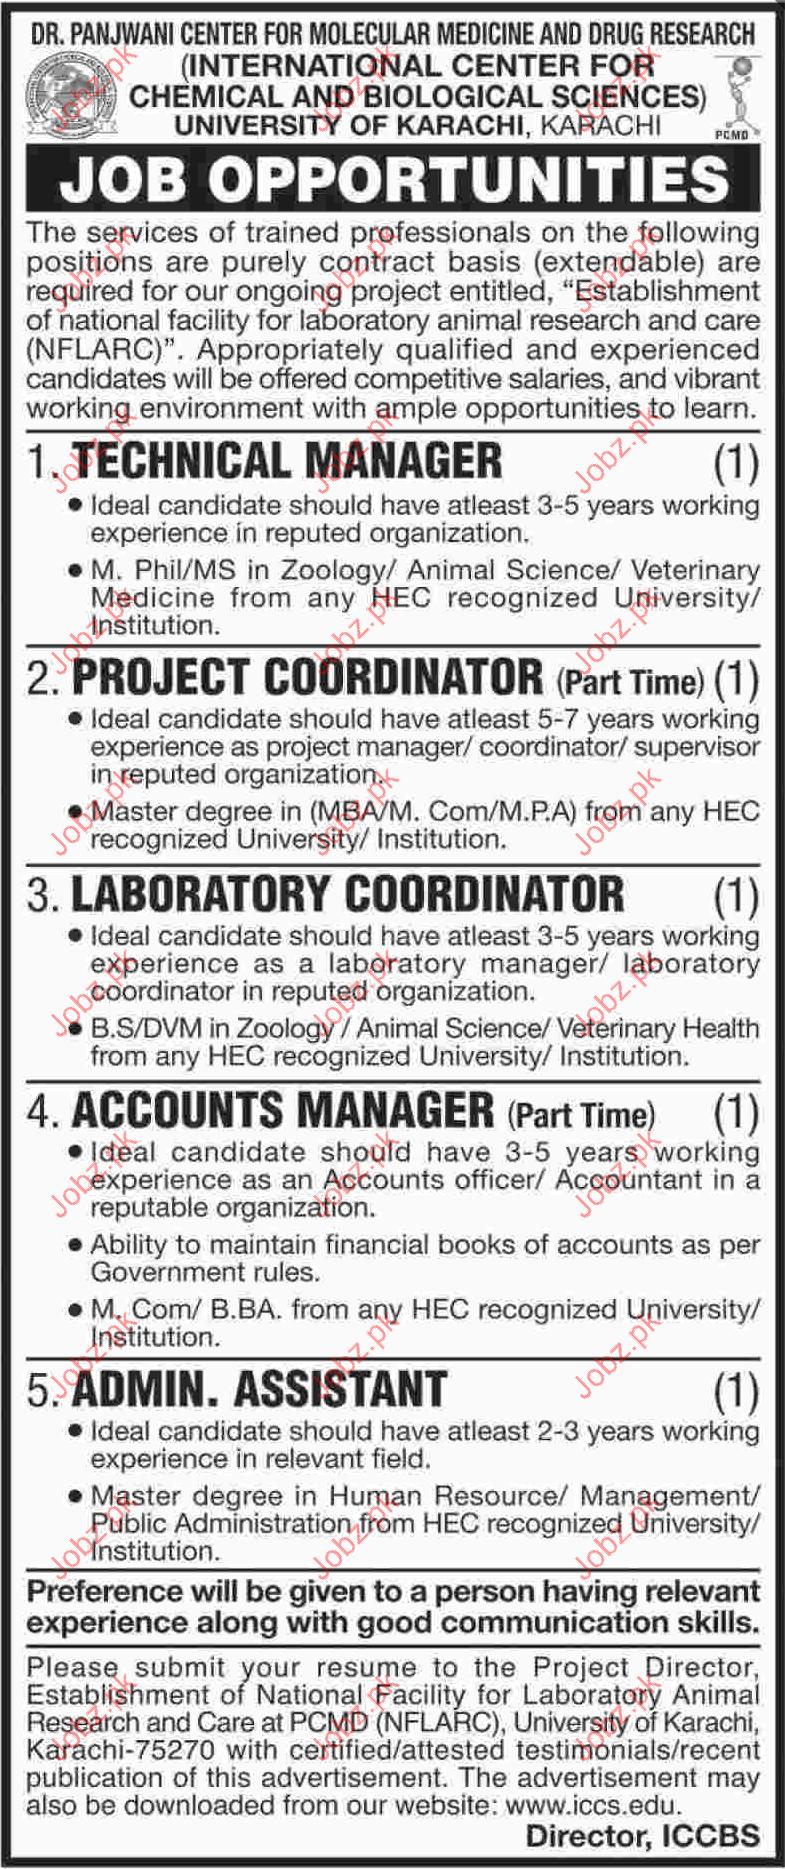 Dr Panjwani Center for Molecular Medicine Drug Research Jobs